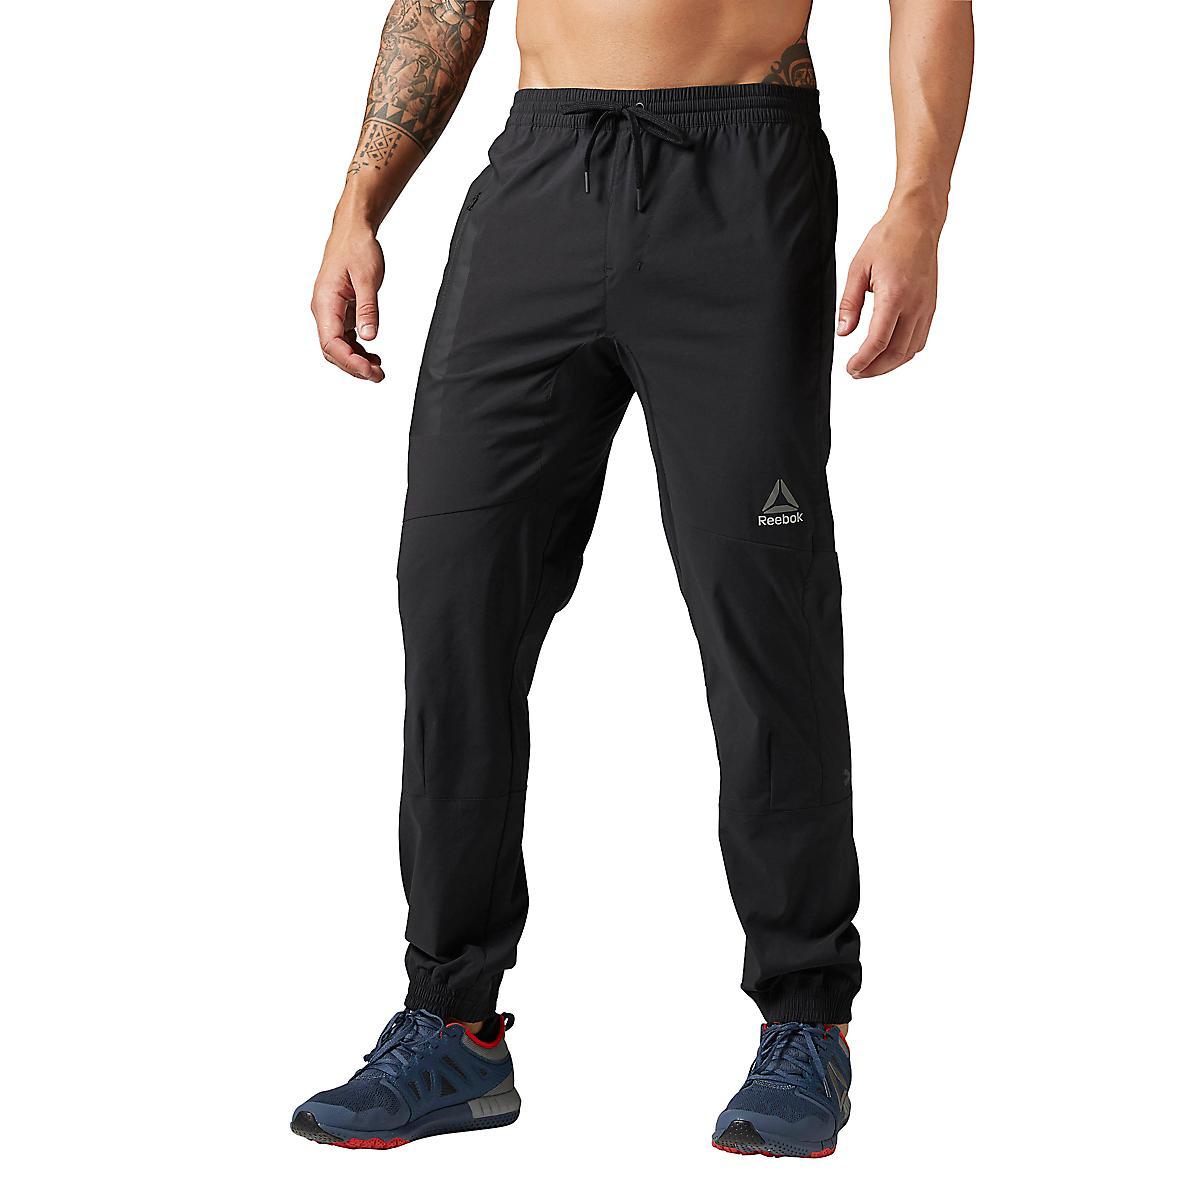 Mens Reebok Elite Woven Jogger Pants At Road Runner Sports